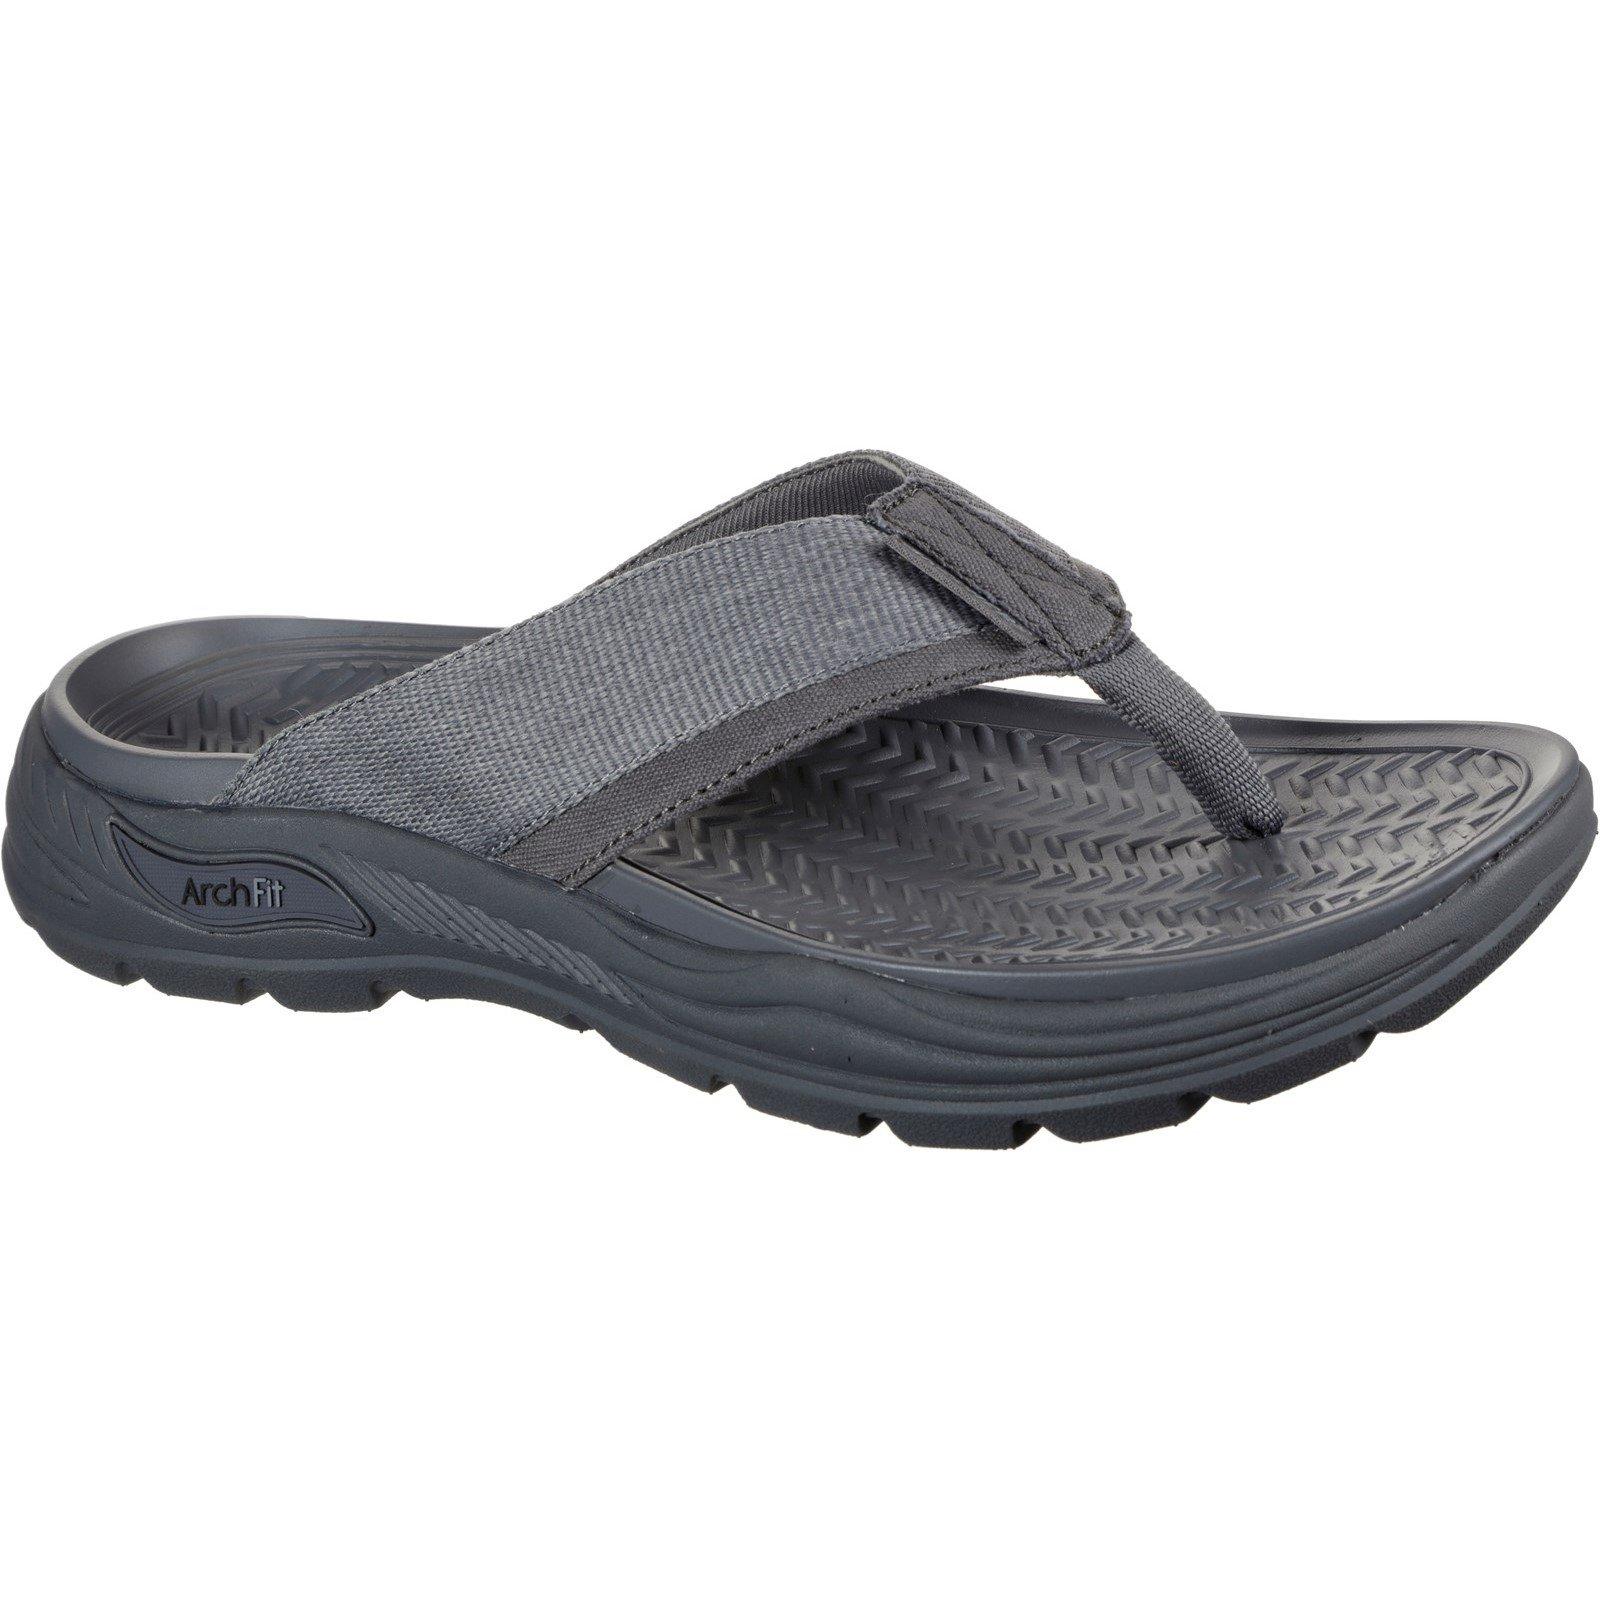 Skechers Men's Arch Fit Motley Dolano Summer Sandal Charcoal 32209 - Charcoal 8